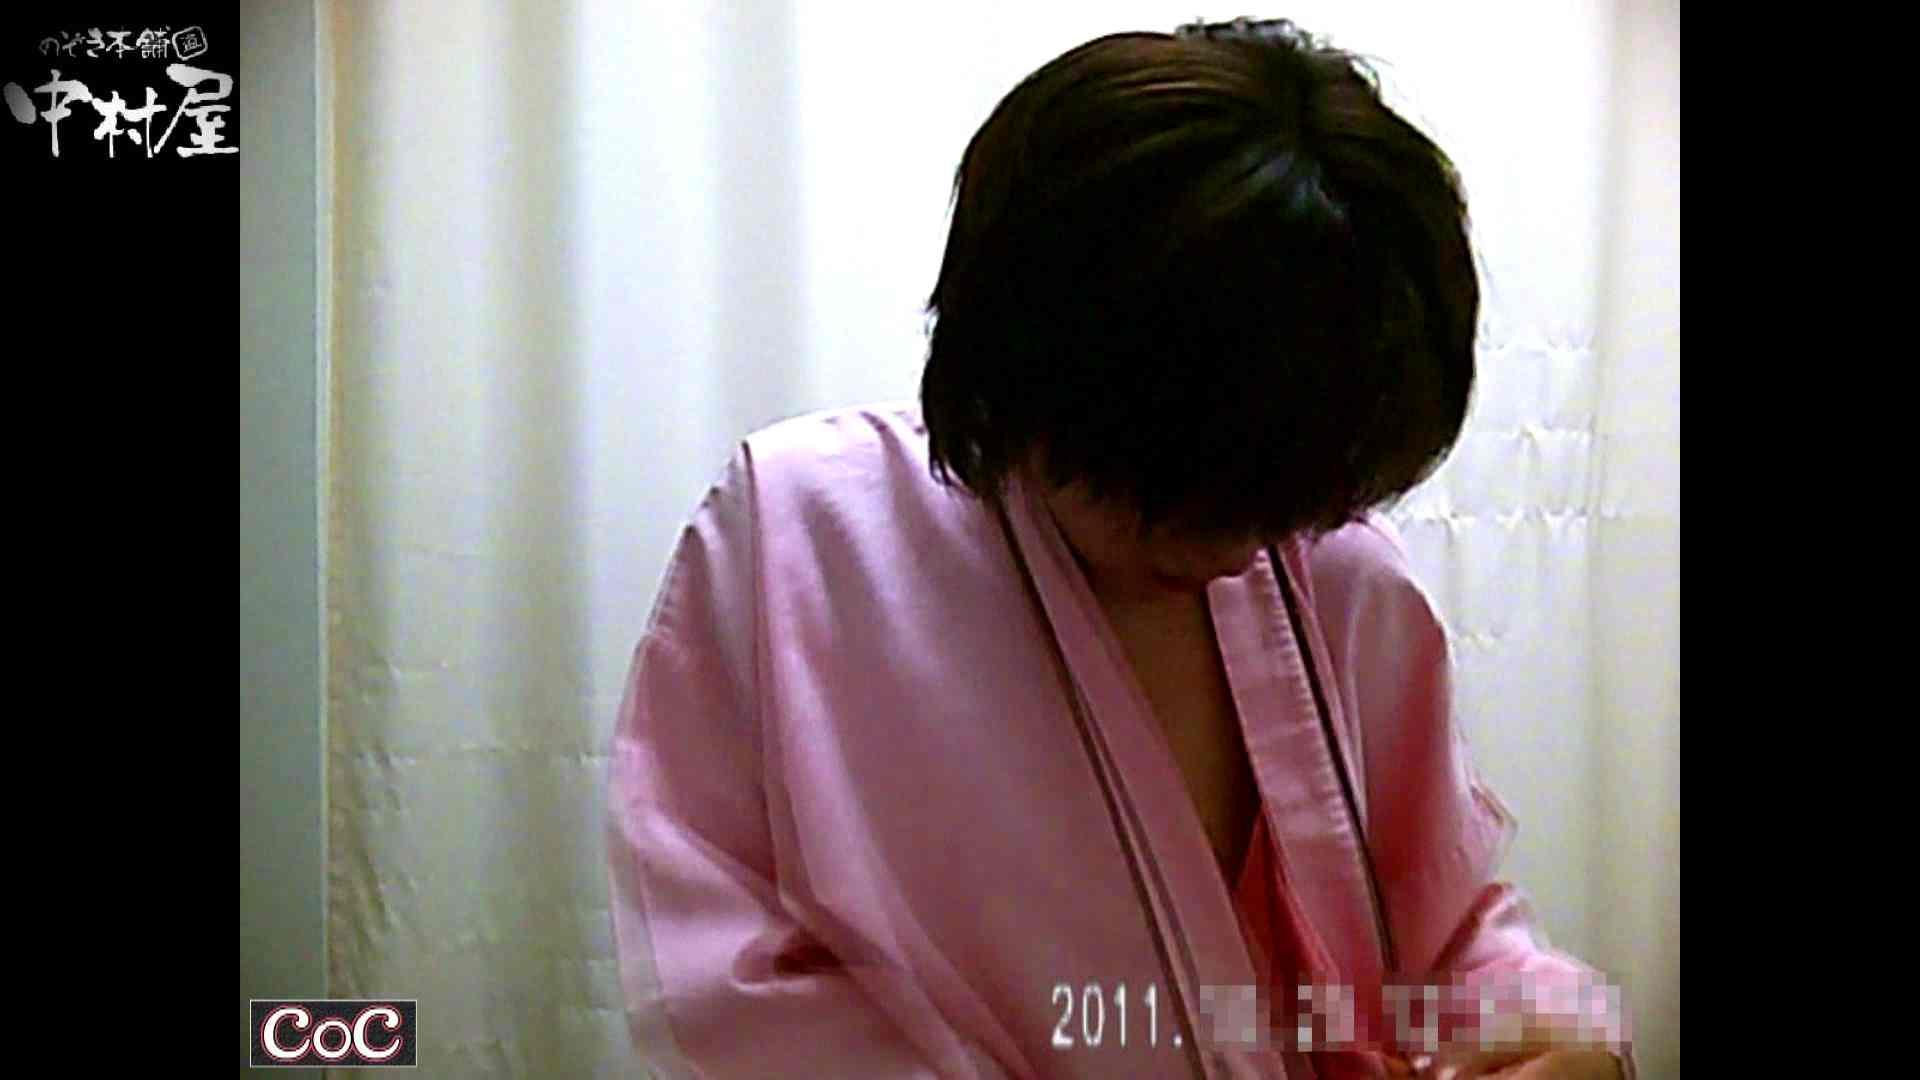 Doctor-X元医者による反抗vol.65 おまんこ見放題 | 盗撮シリーズ  102PIX 39